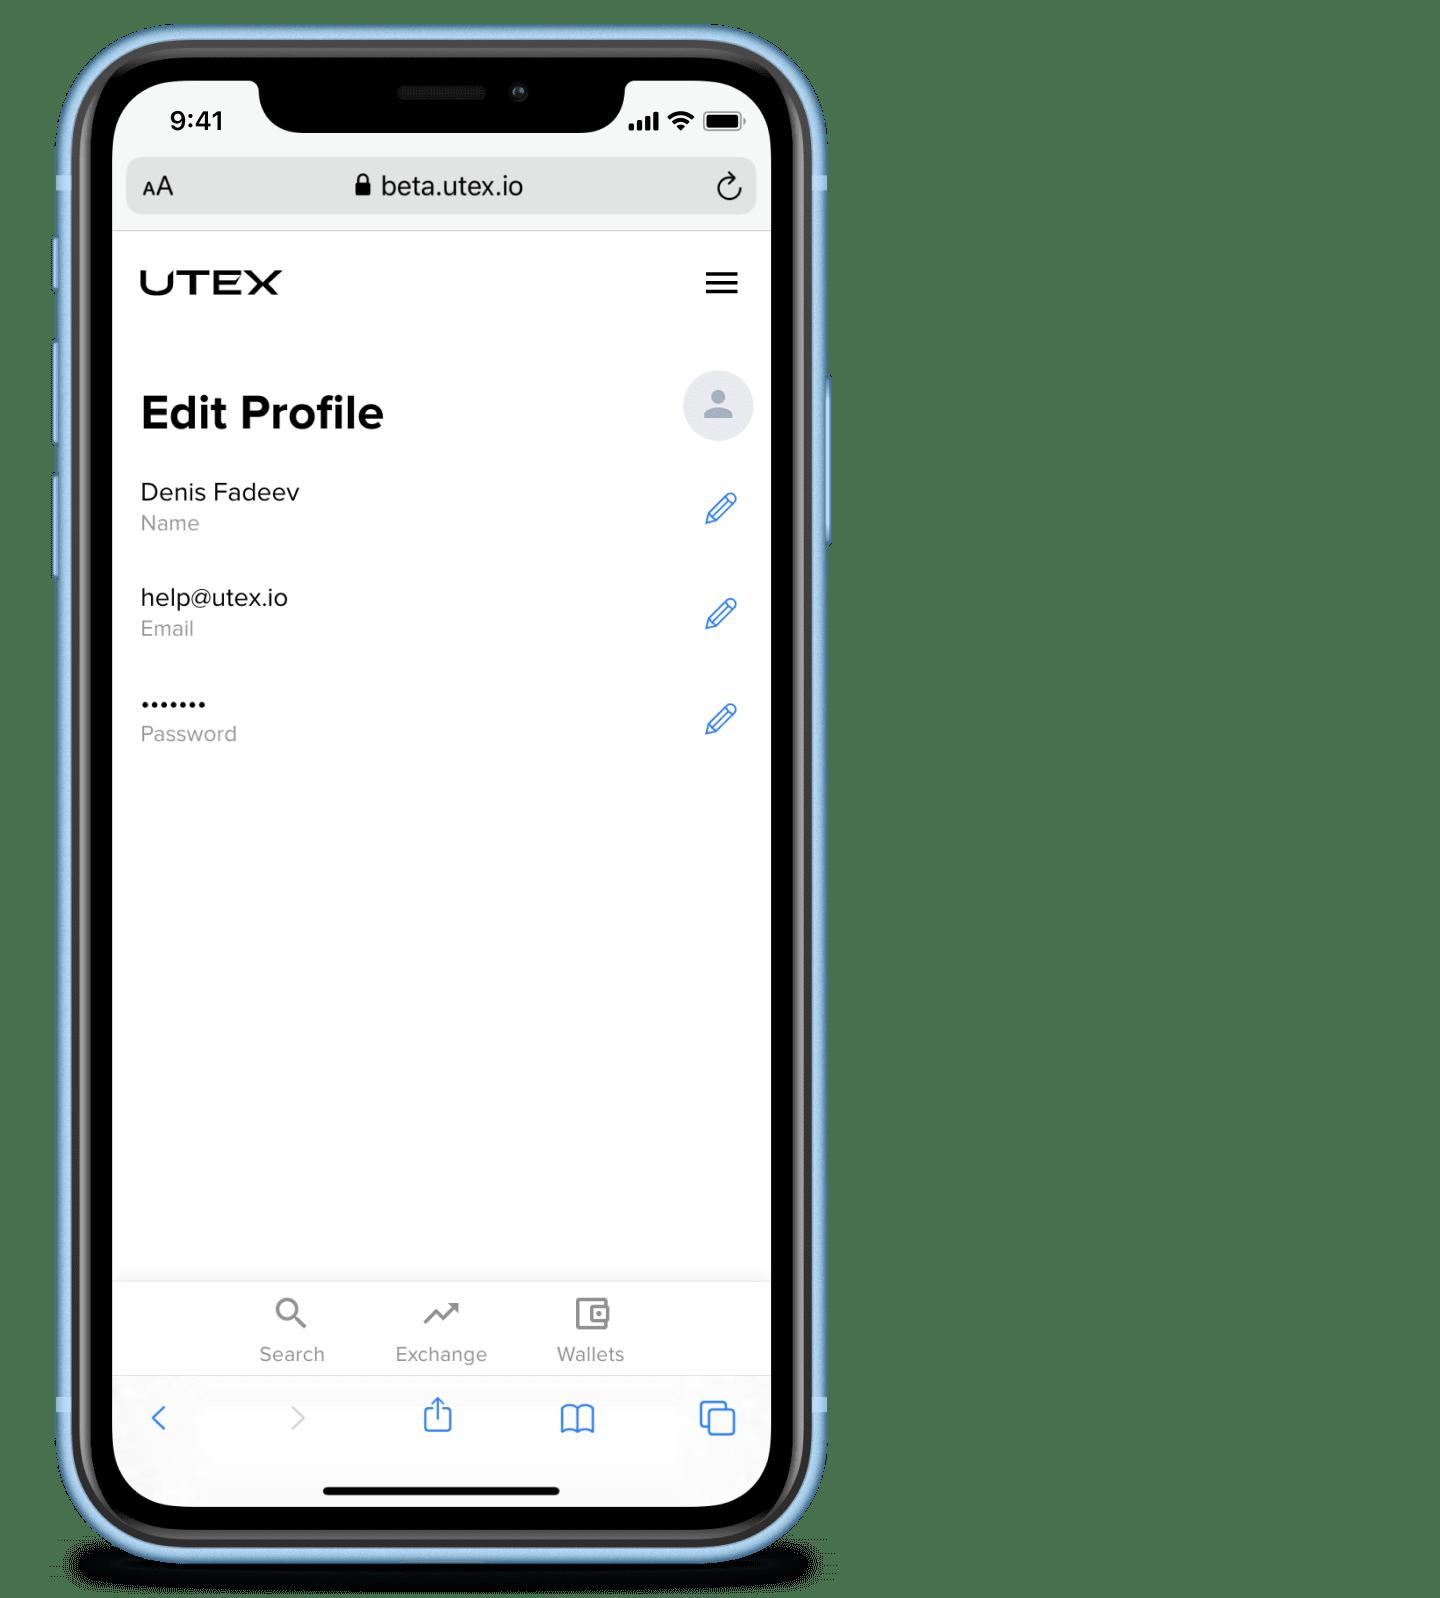 Editing user data